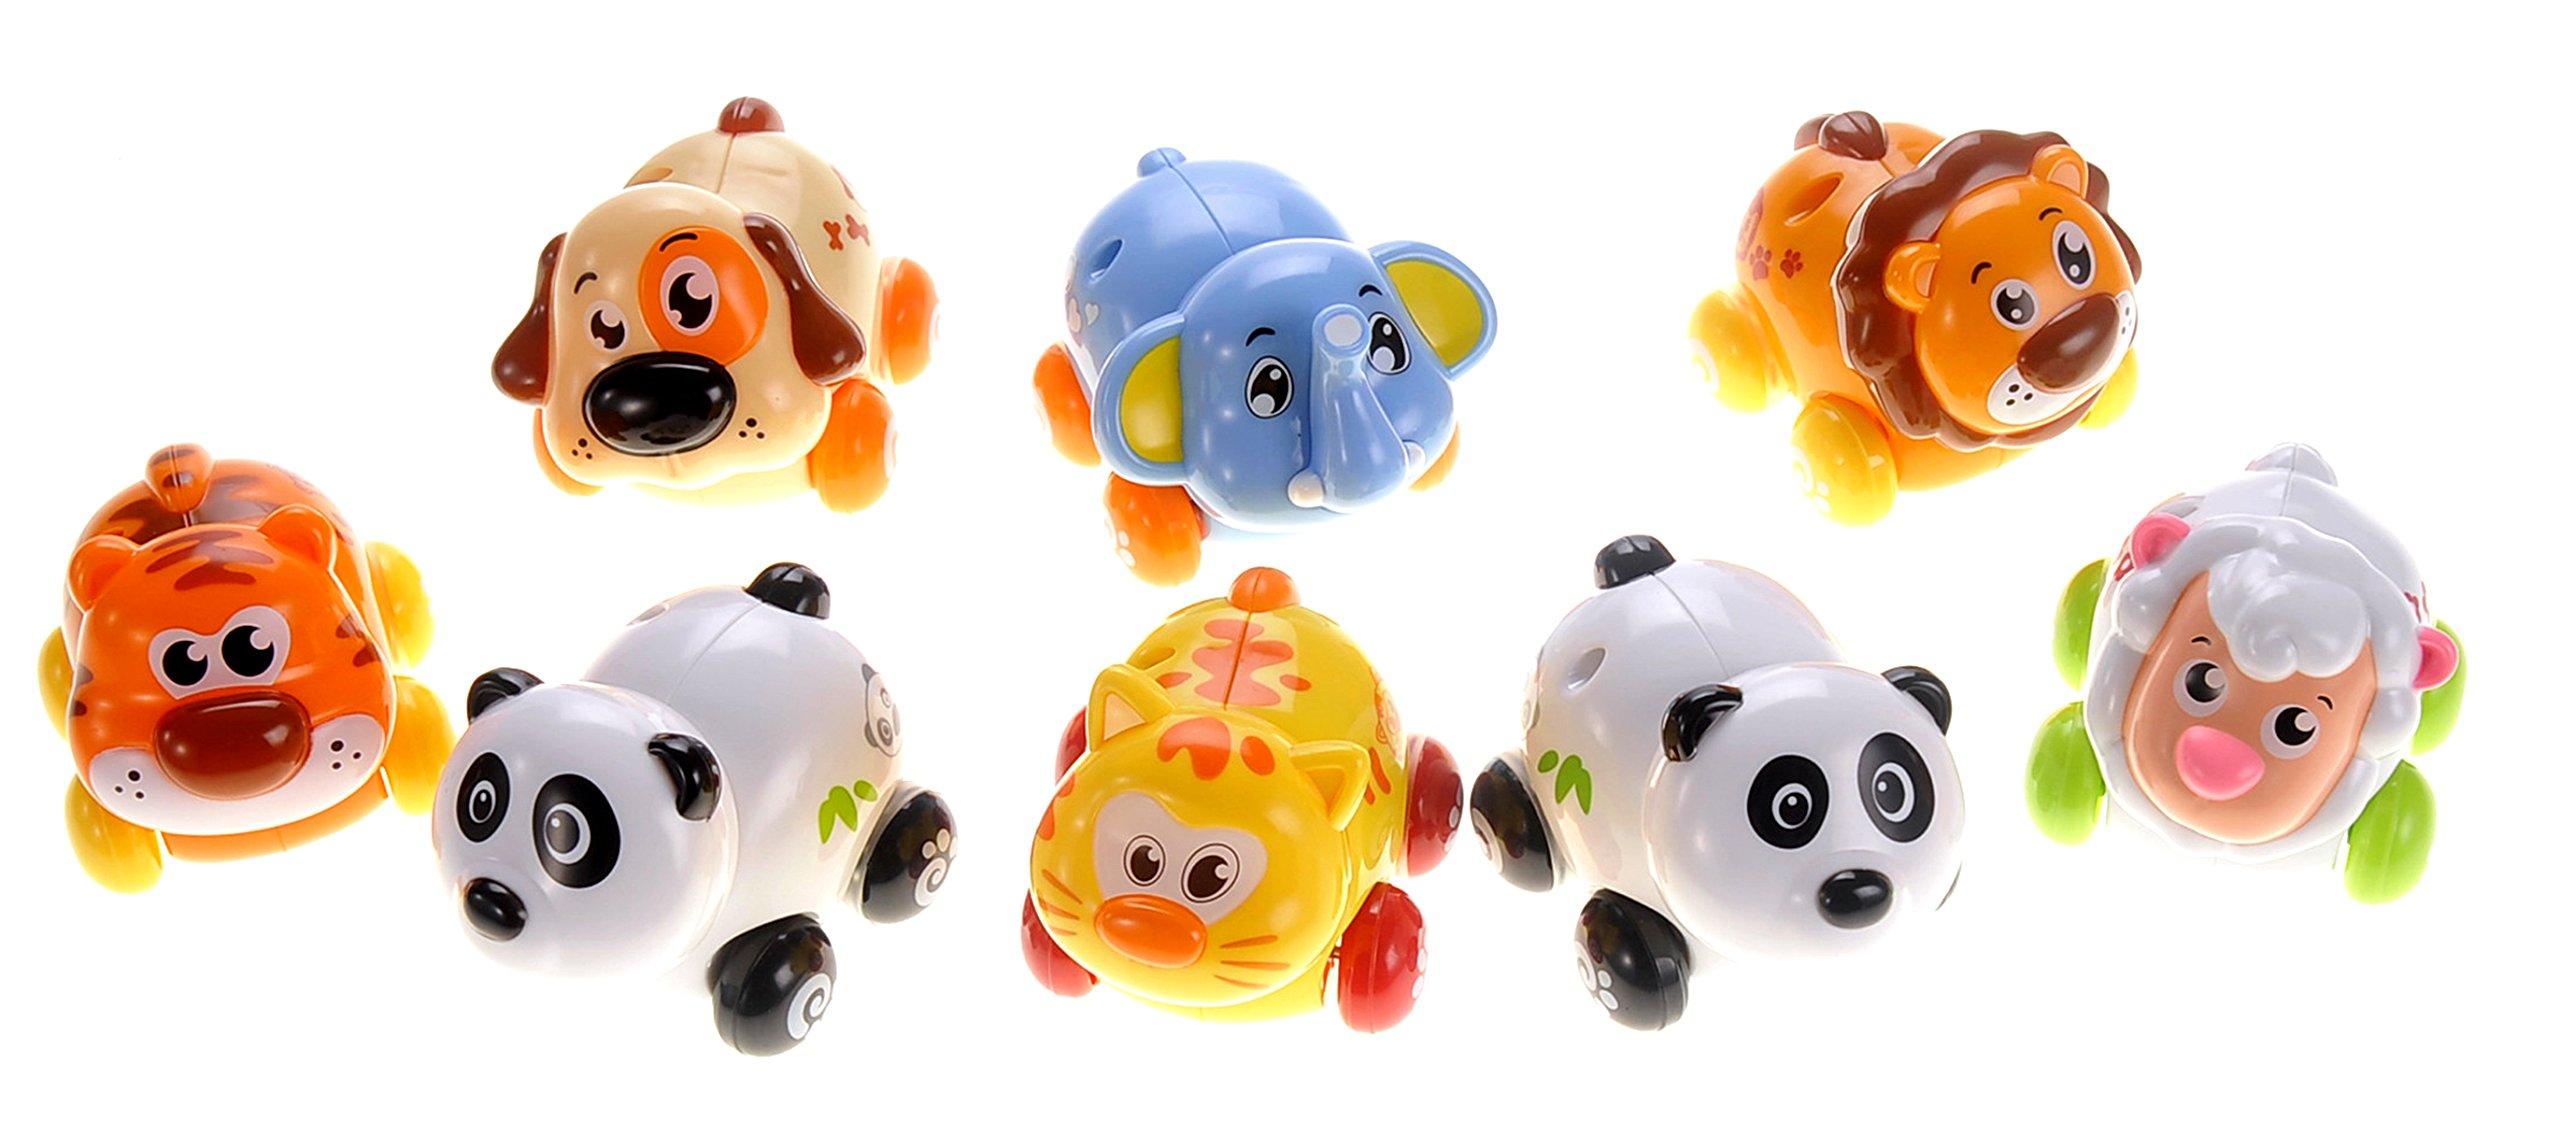 PowerTRC Cartoon Animals Friction Push and Go Toy Cars Play Set (Set of 8) Panda, Cat, Elephant, Dog, Lion, Tiger and Sheep